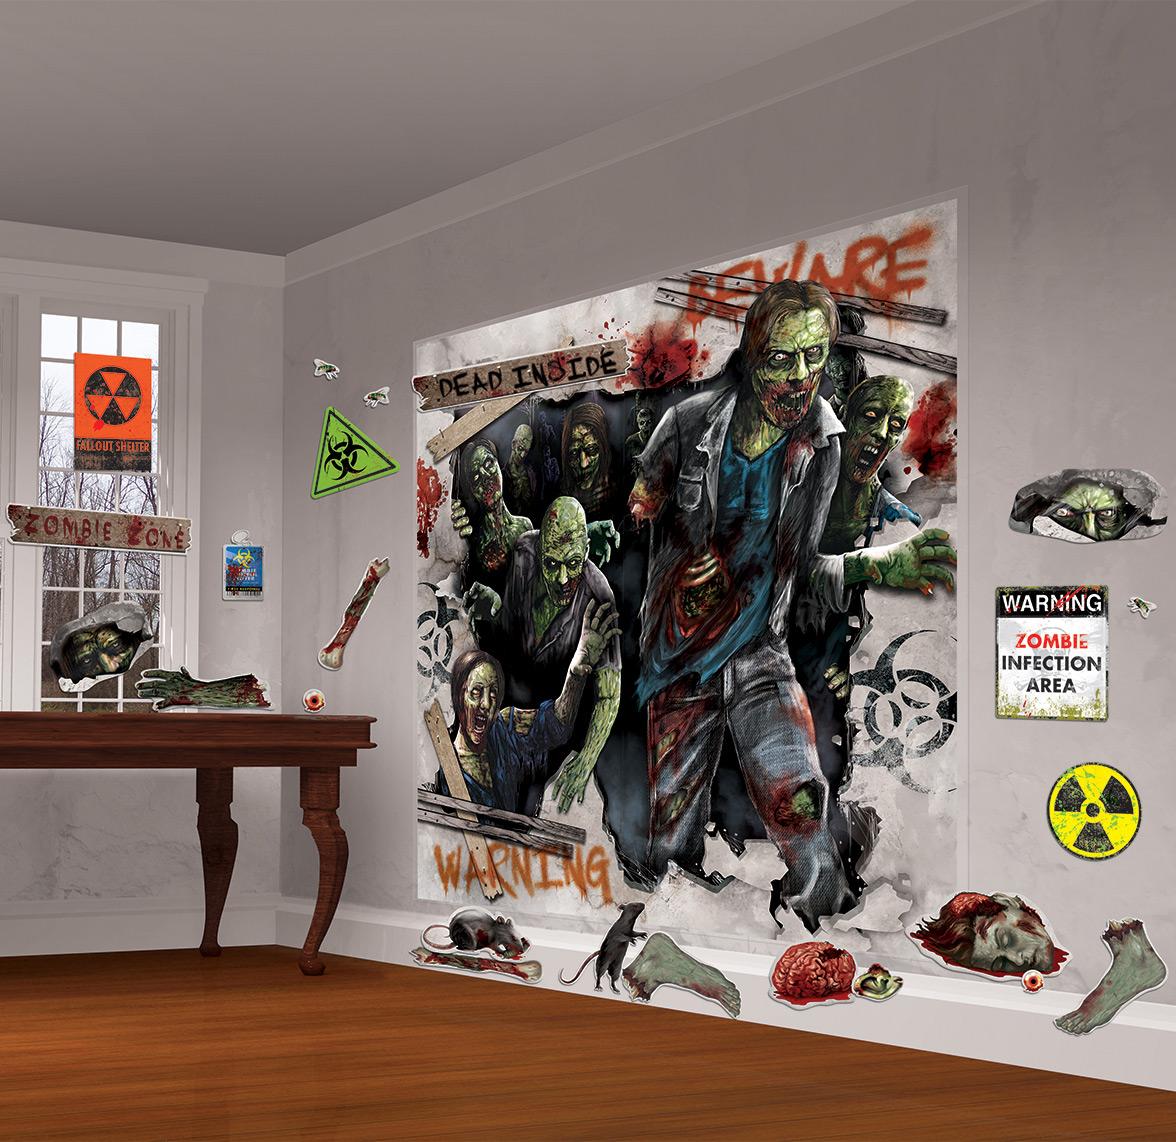 schaurige zombies halloween mega deko set 32 teilig bunt. Black Bedroom Furniture Sets. Home Design Ideas